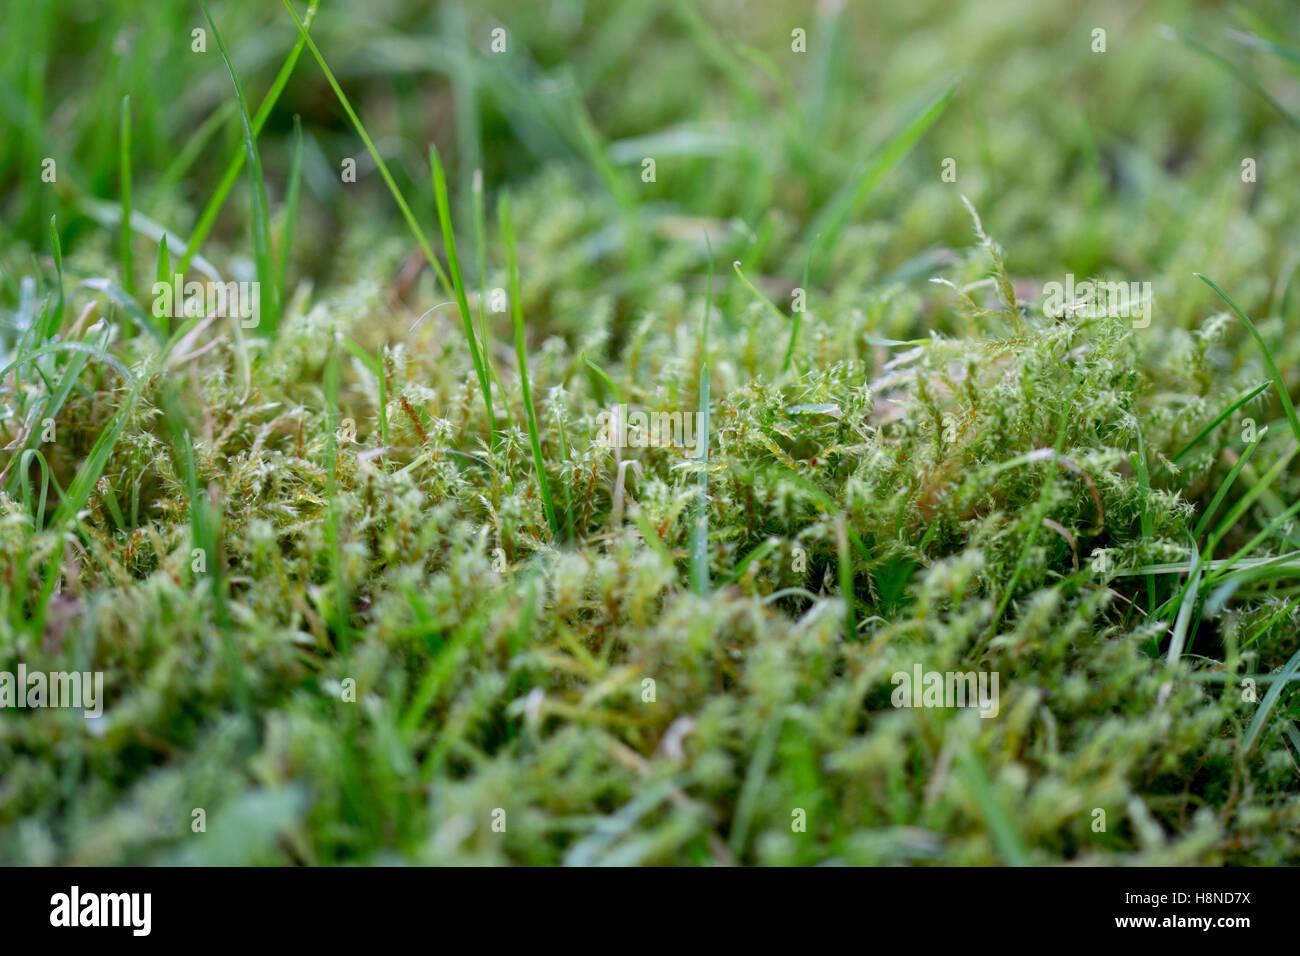 Moss growing in garden lawn - Stock Image